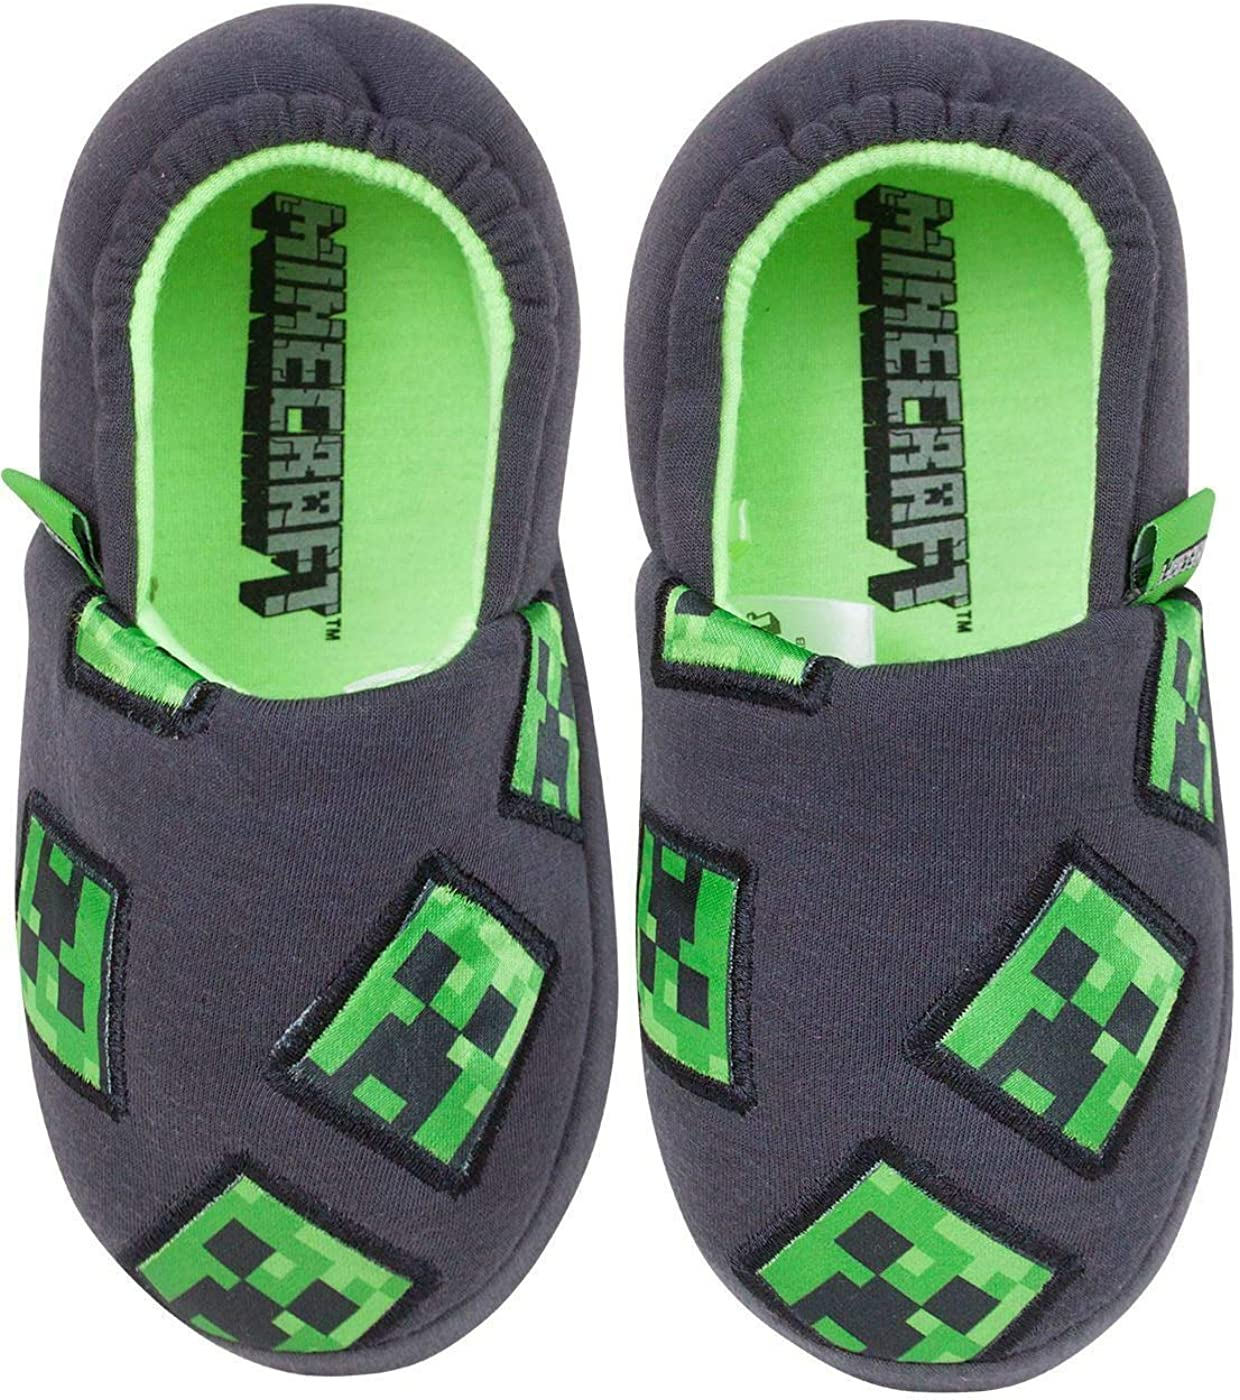 Minecraft Creeper Boys Slippers